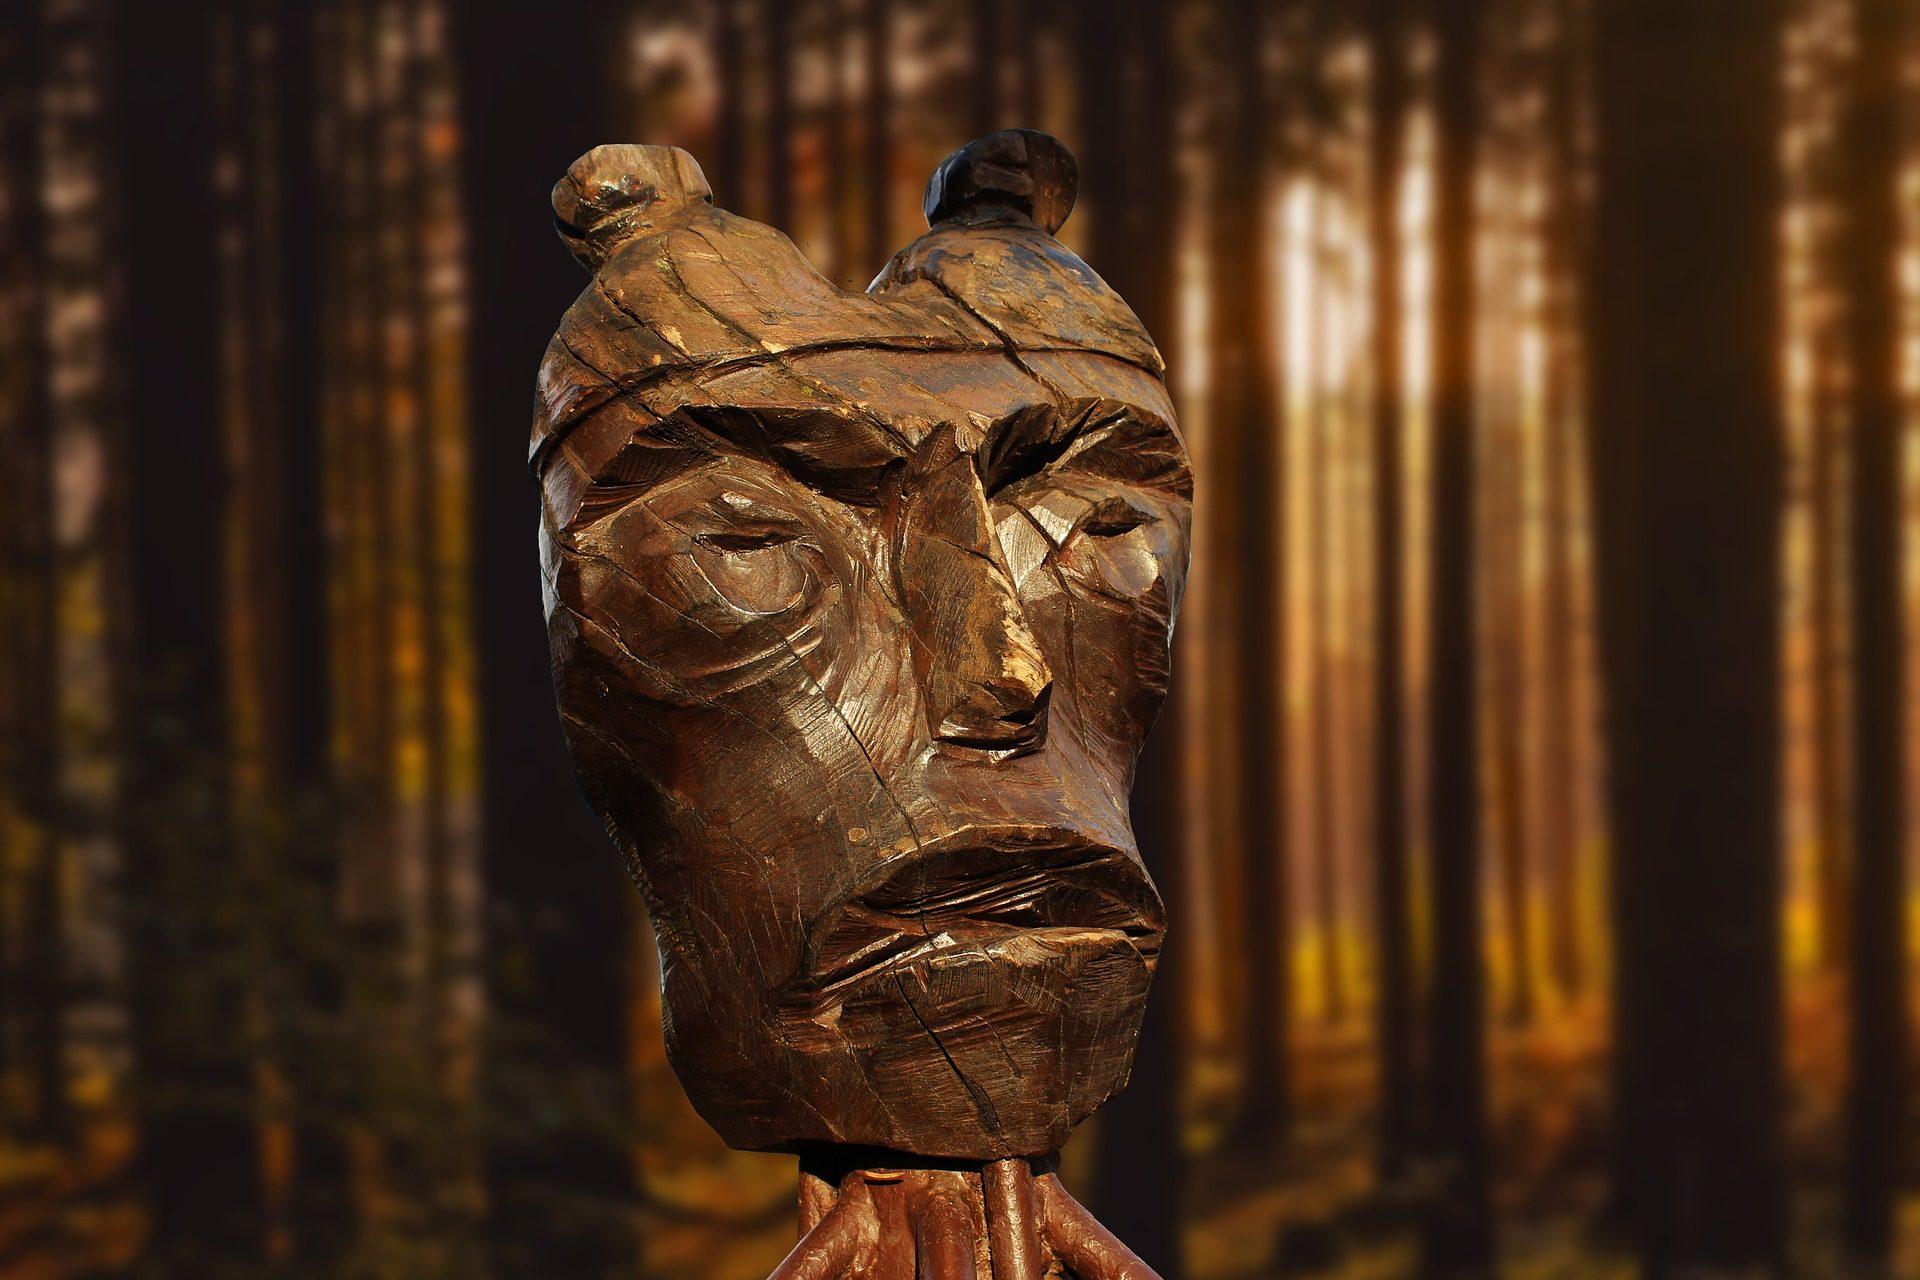 Totem, bois, visage, Forest, arbres - Fonds d'écran HD - Professor-falken.com